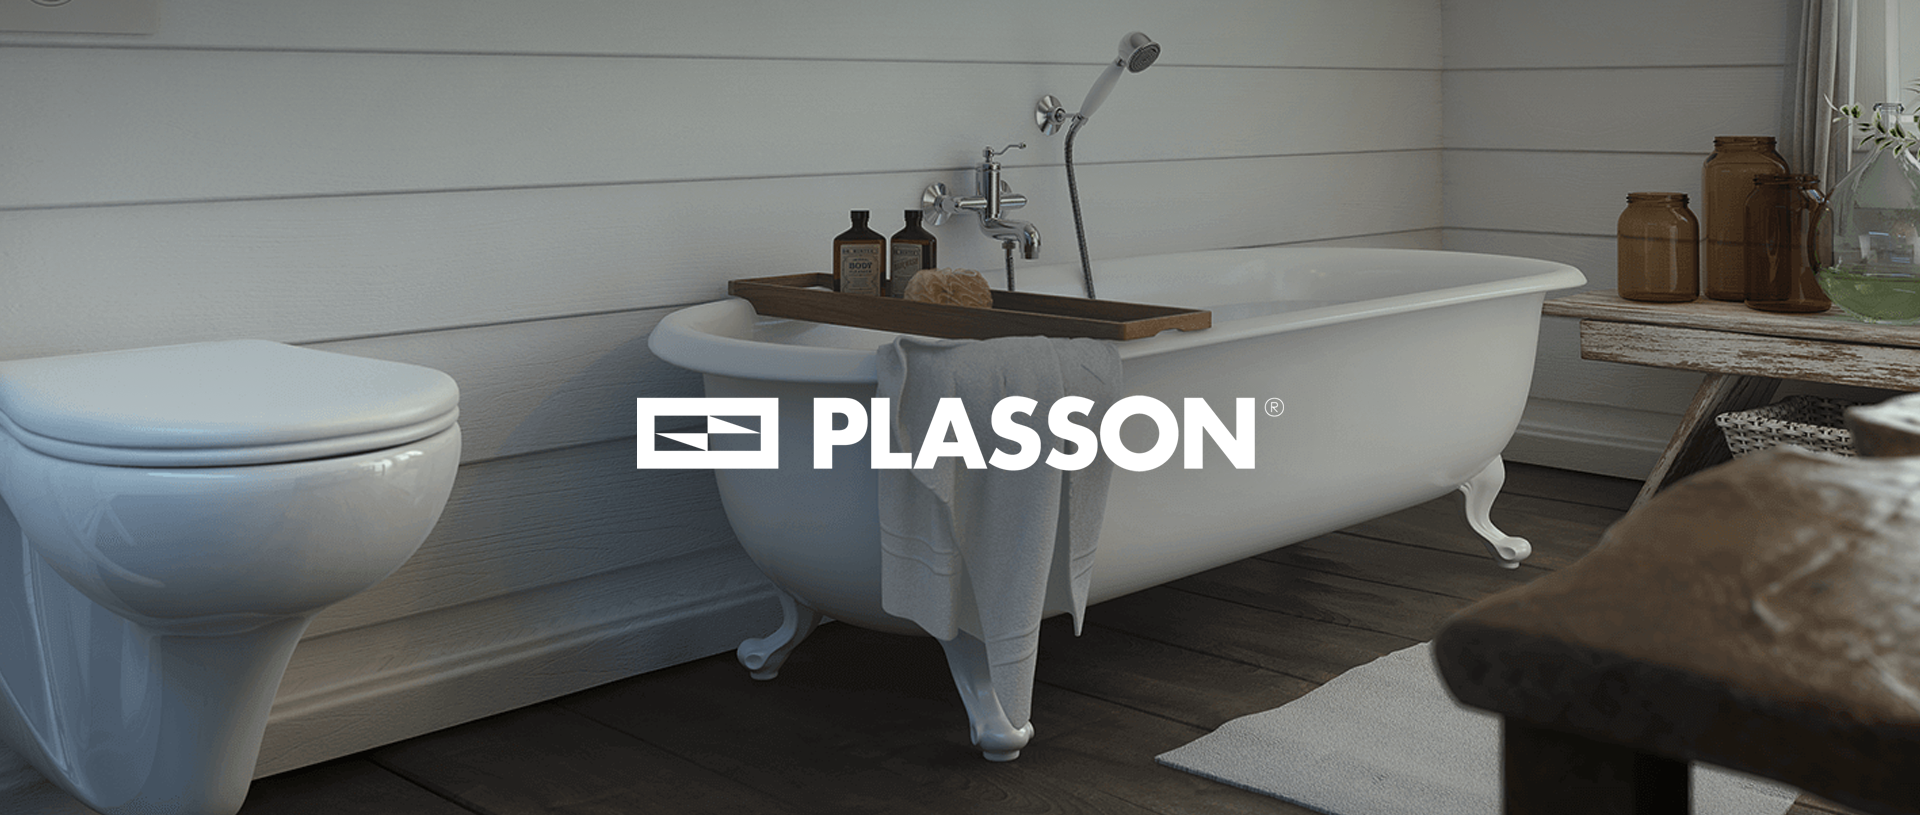 Plasson a B2B & B2C eCommerce Platform